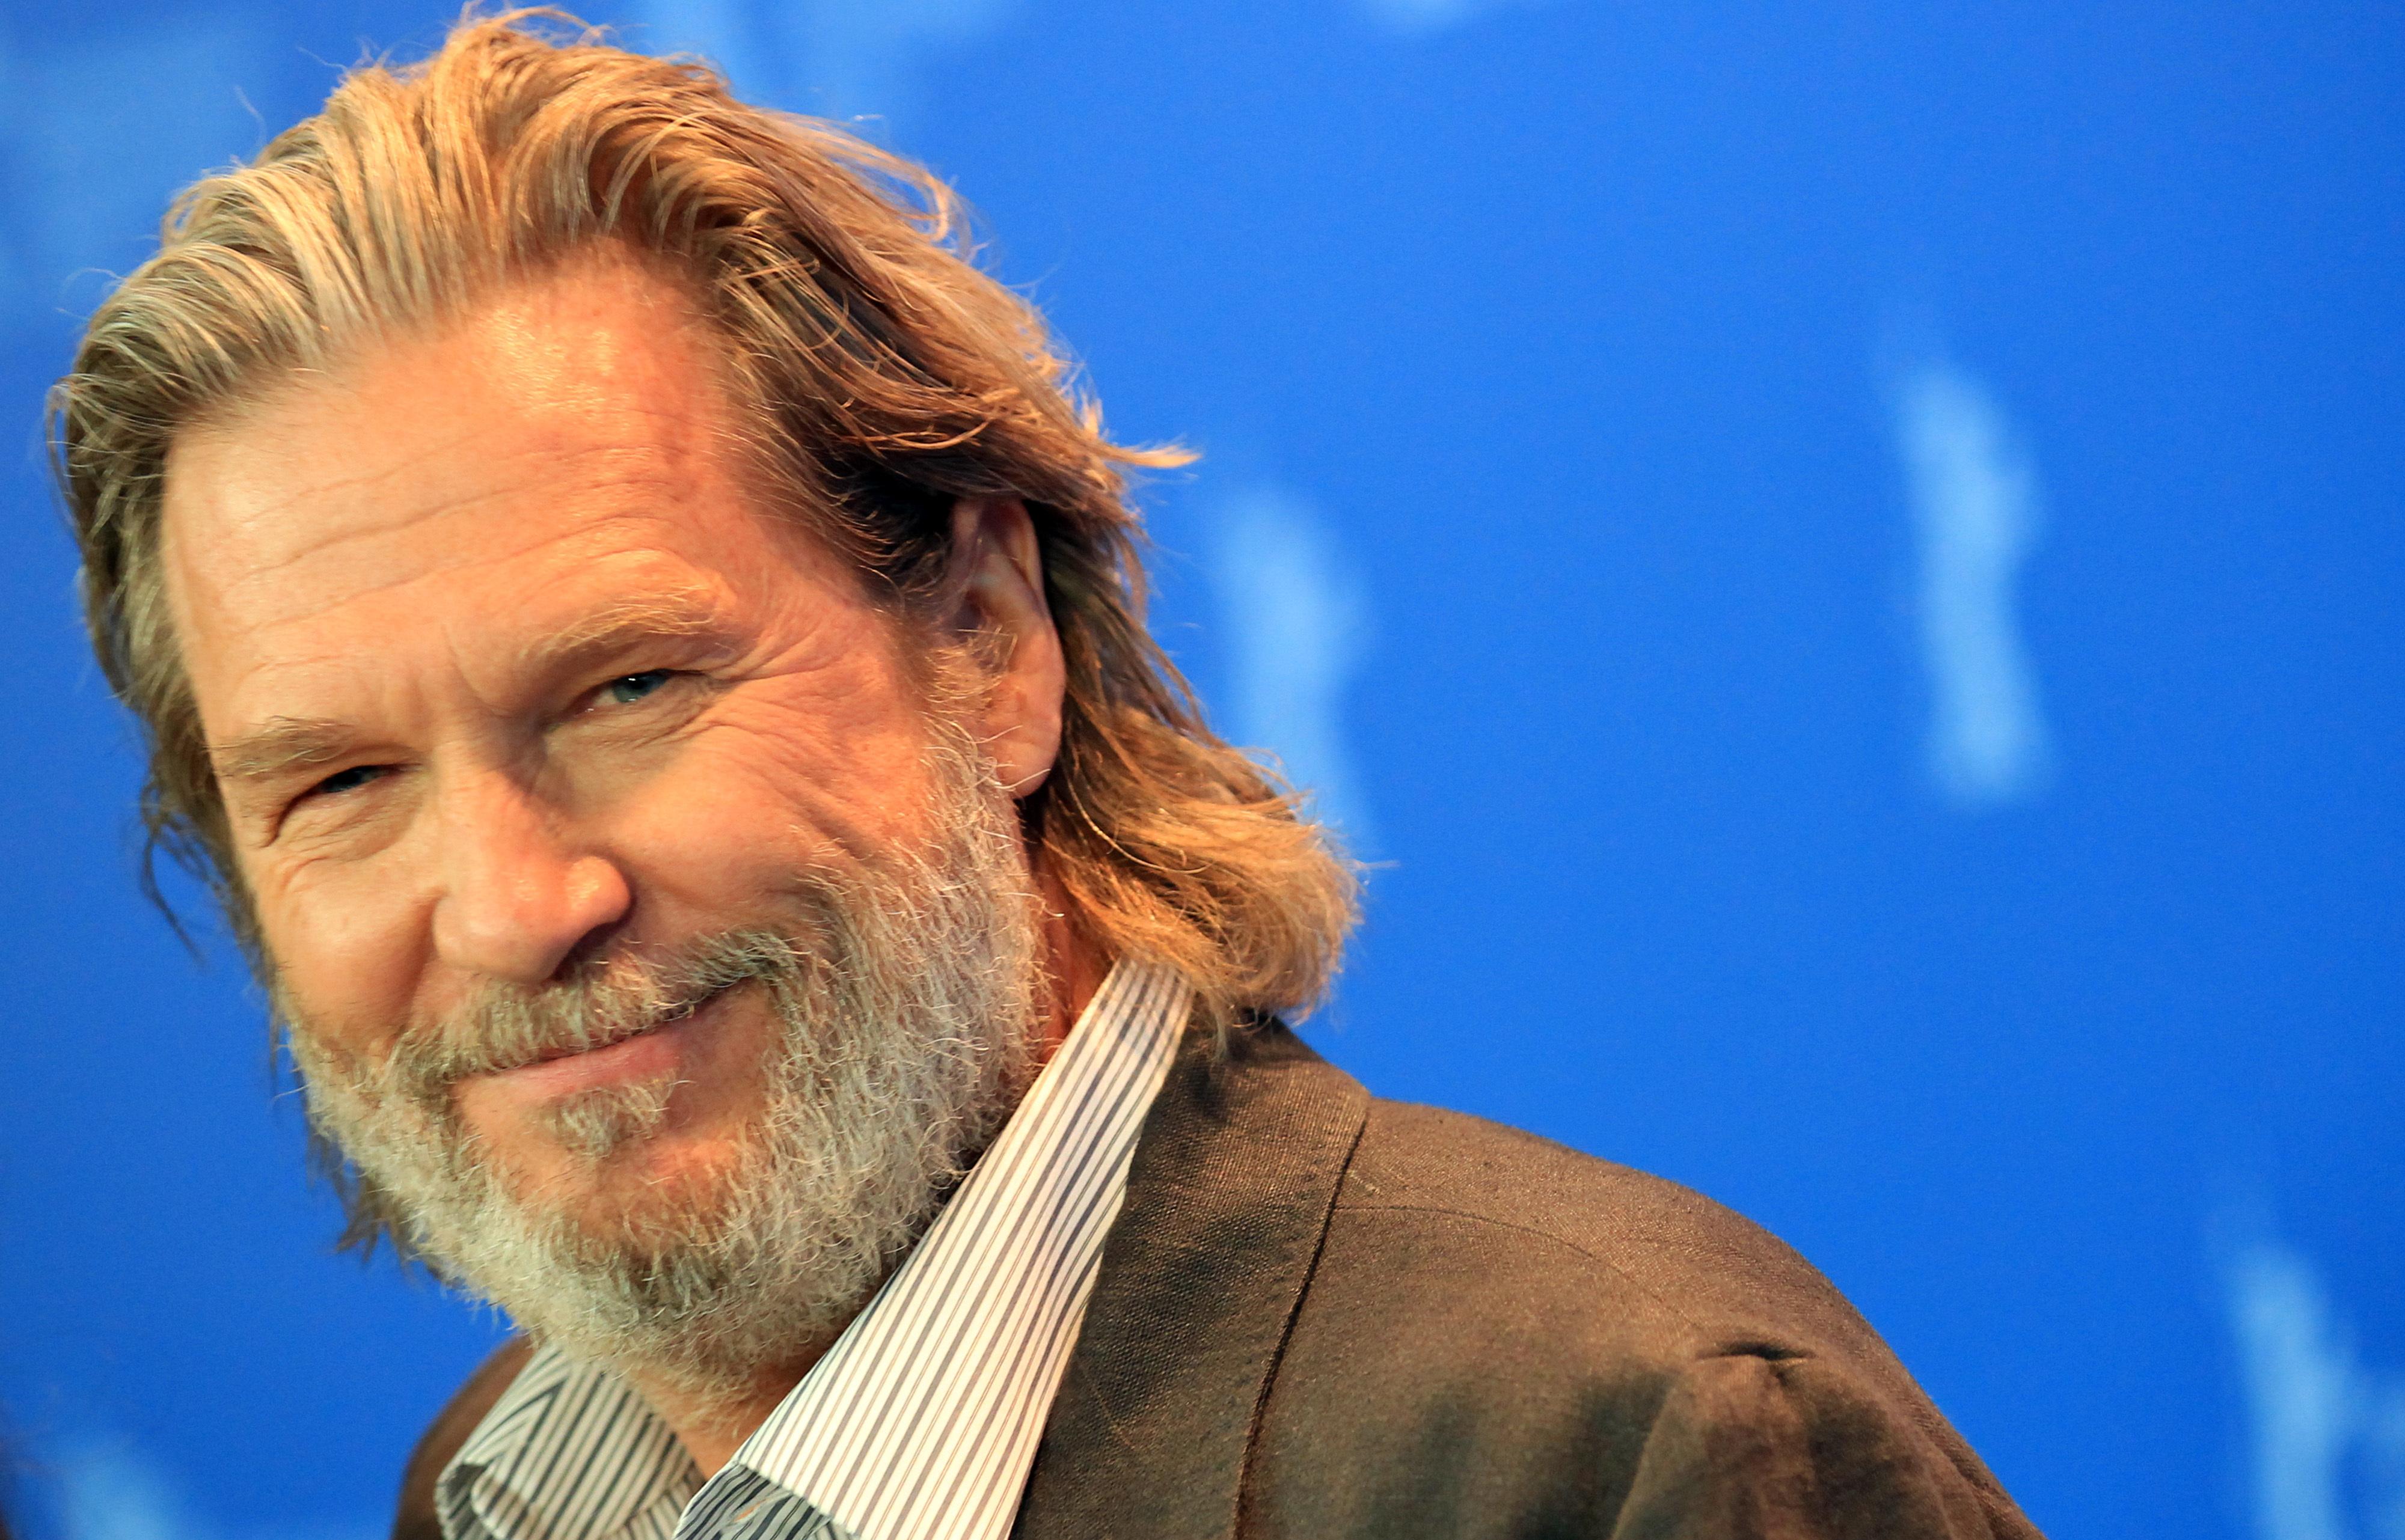 Jeff Bridges rákja visszahúzódófélben van